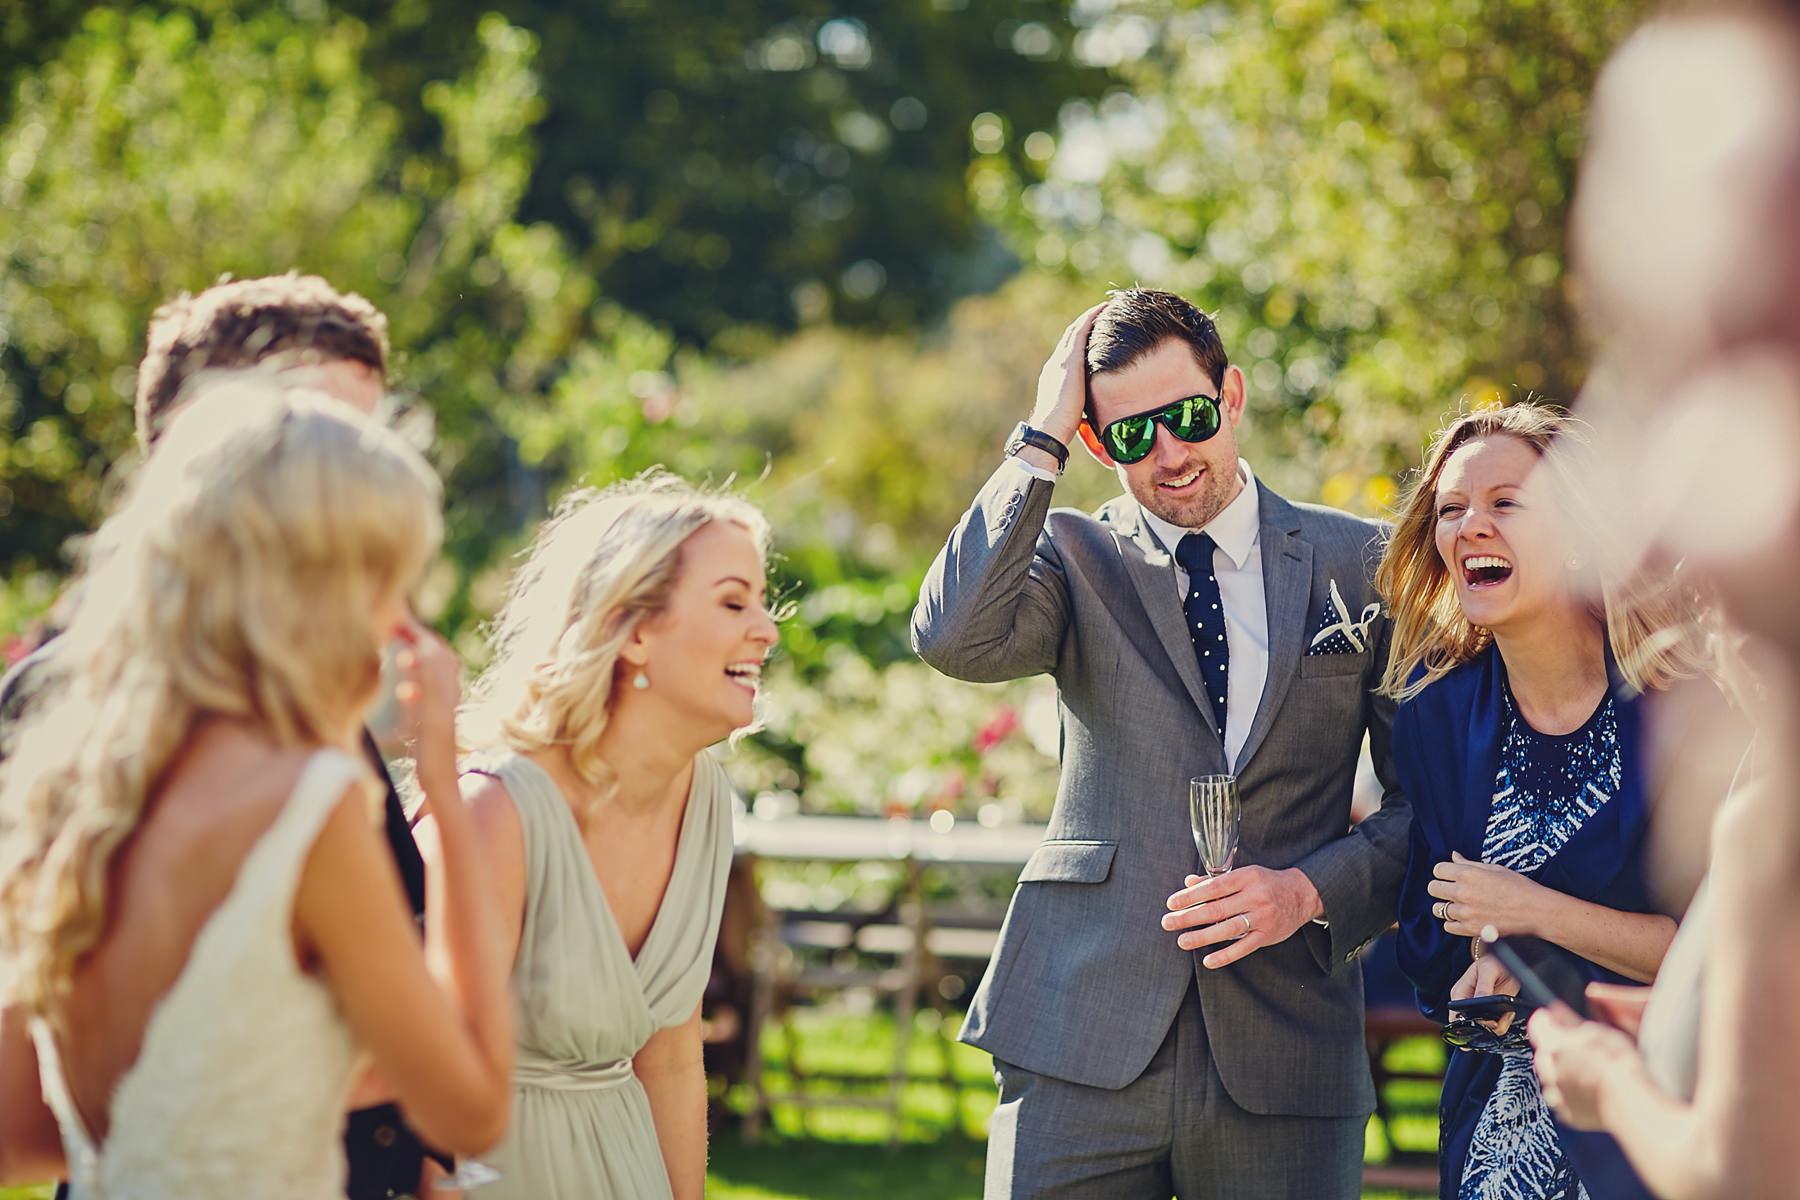 Wedding at Borris House co.Carlow 048 - Borris House wedding | Cara & David